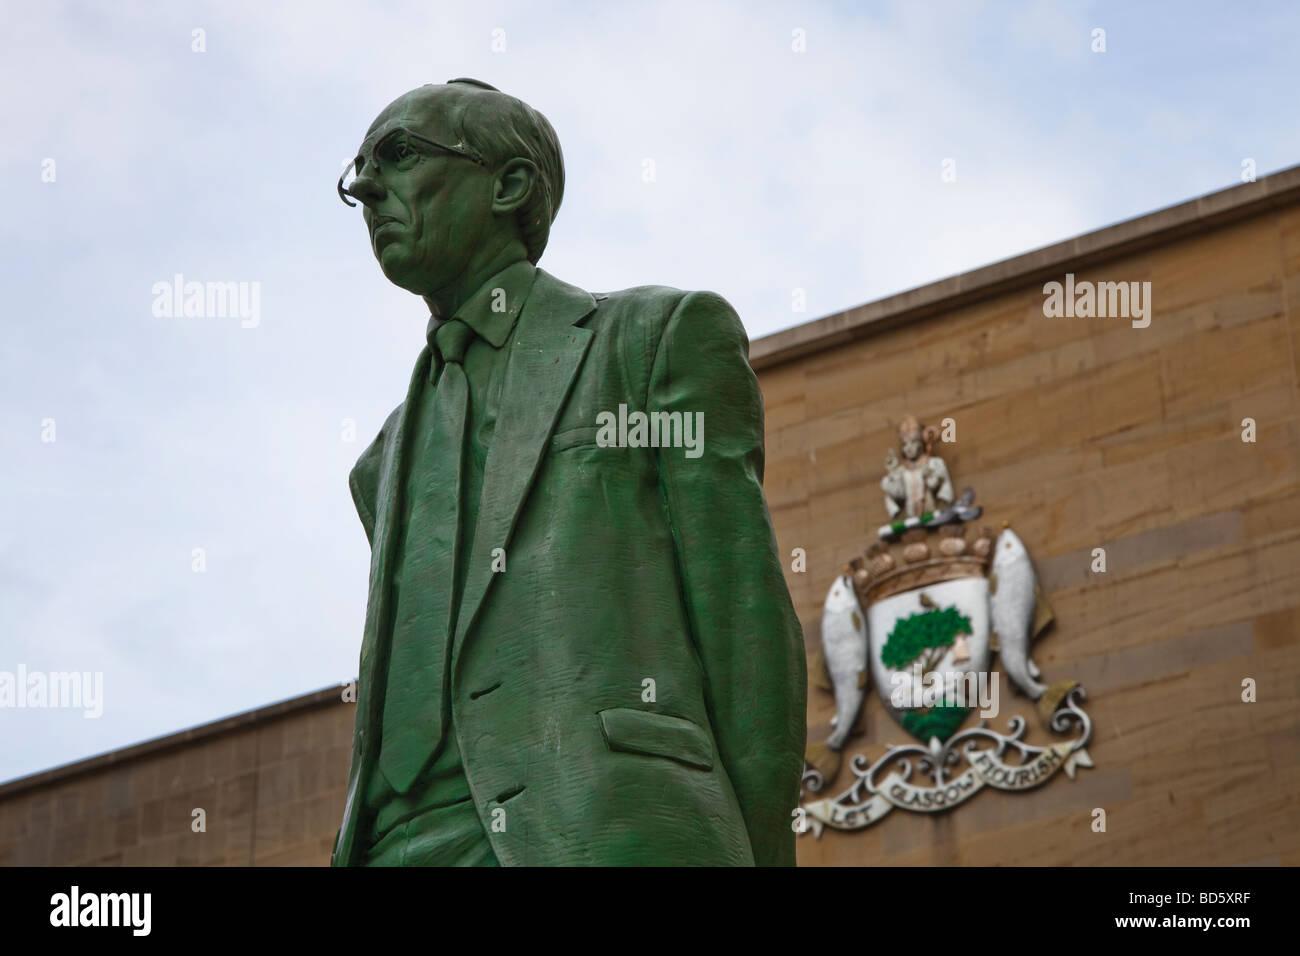 Statue of Donald Dewar, Member of Parliament and First Minister of Scotland, Buchanan Street, Glasgow, Scotland, - Stock Image